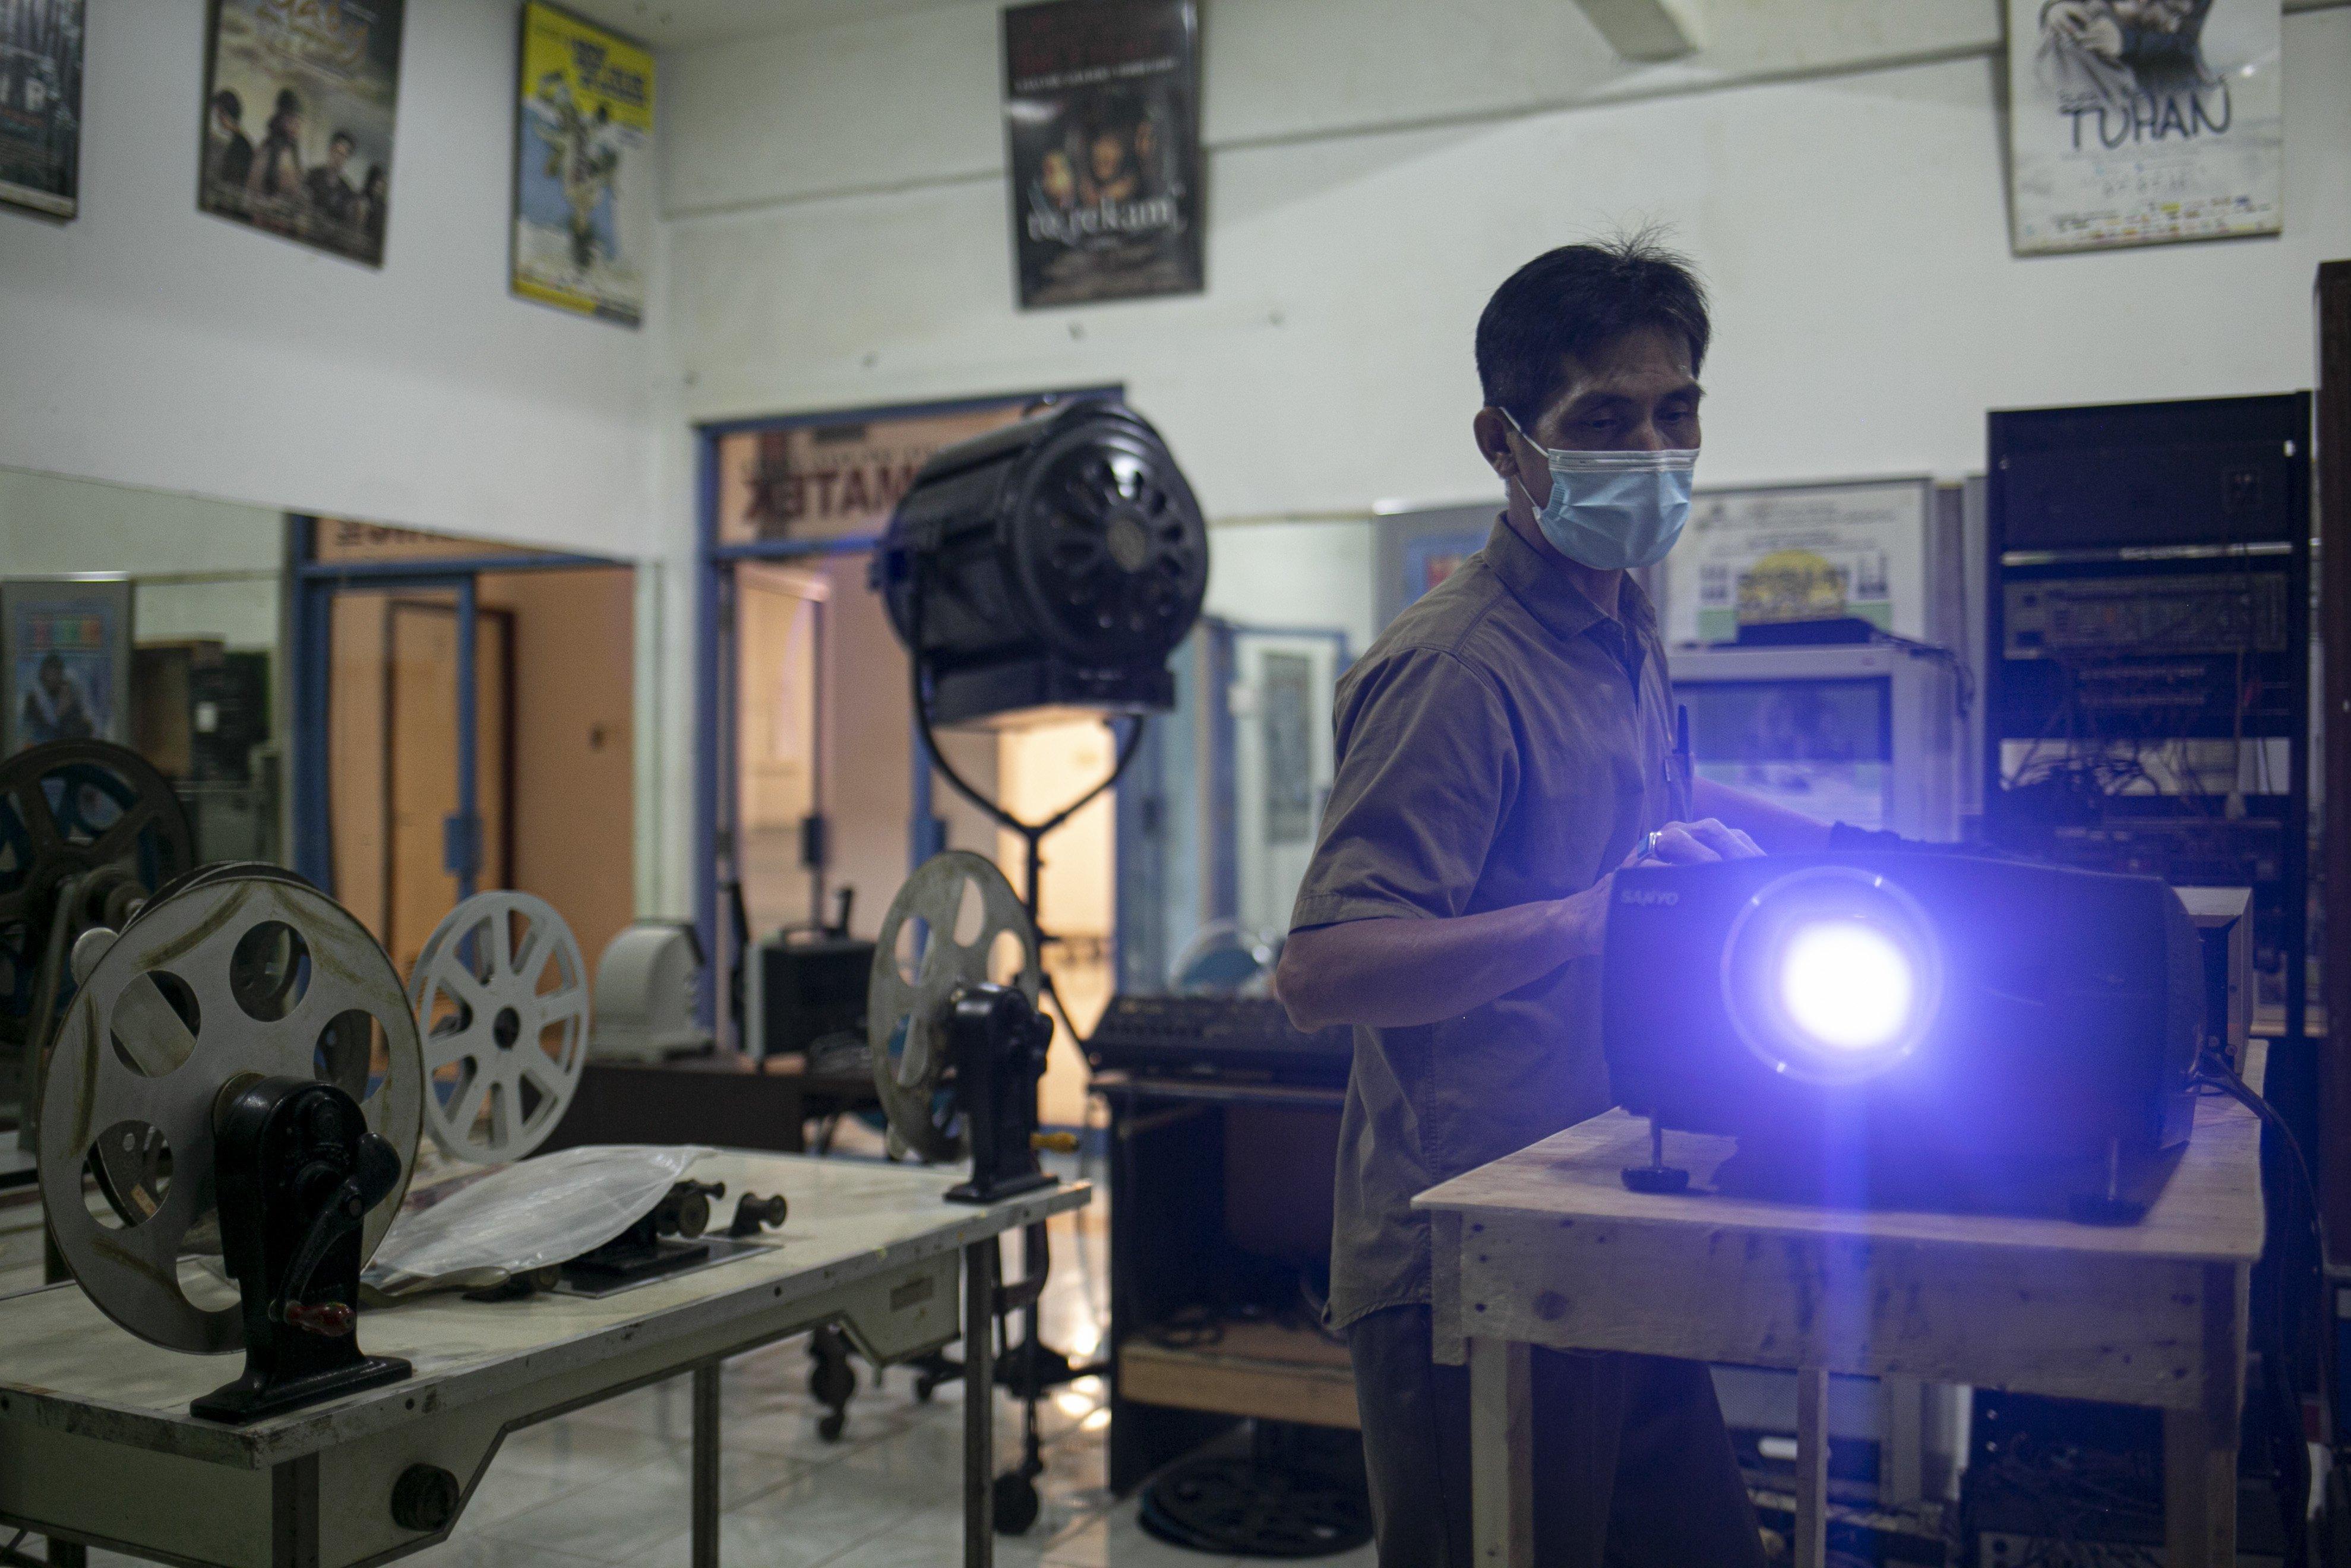 Firdaus (50), memutar film di Gedung Sinematek, jalan HR. Rasuna Said, RT.2/RW.5, Karet Kuningan, Kecamatan Setiabudi, Kota Jakarta Selatan.